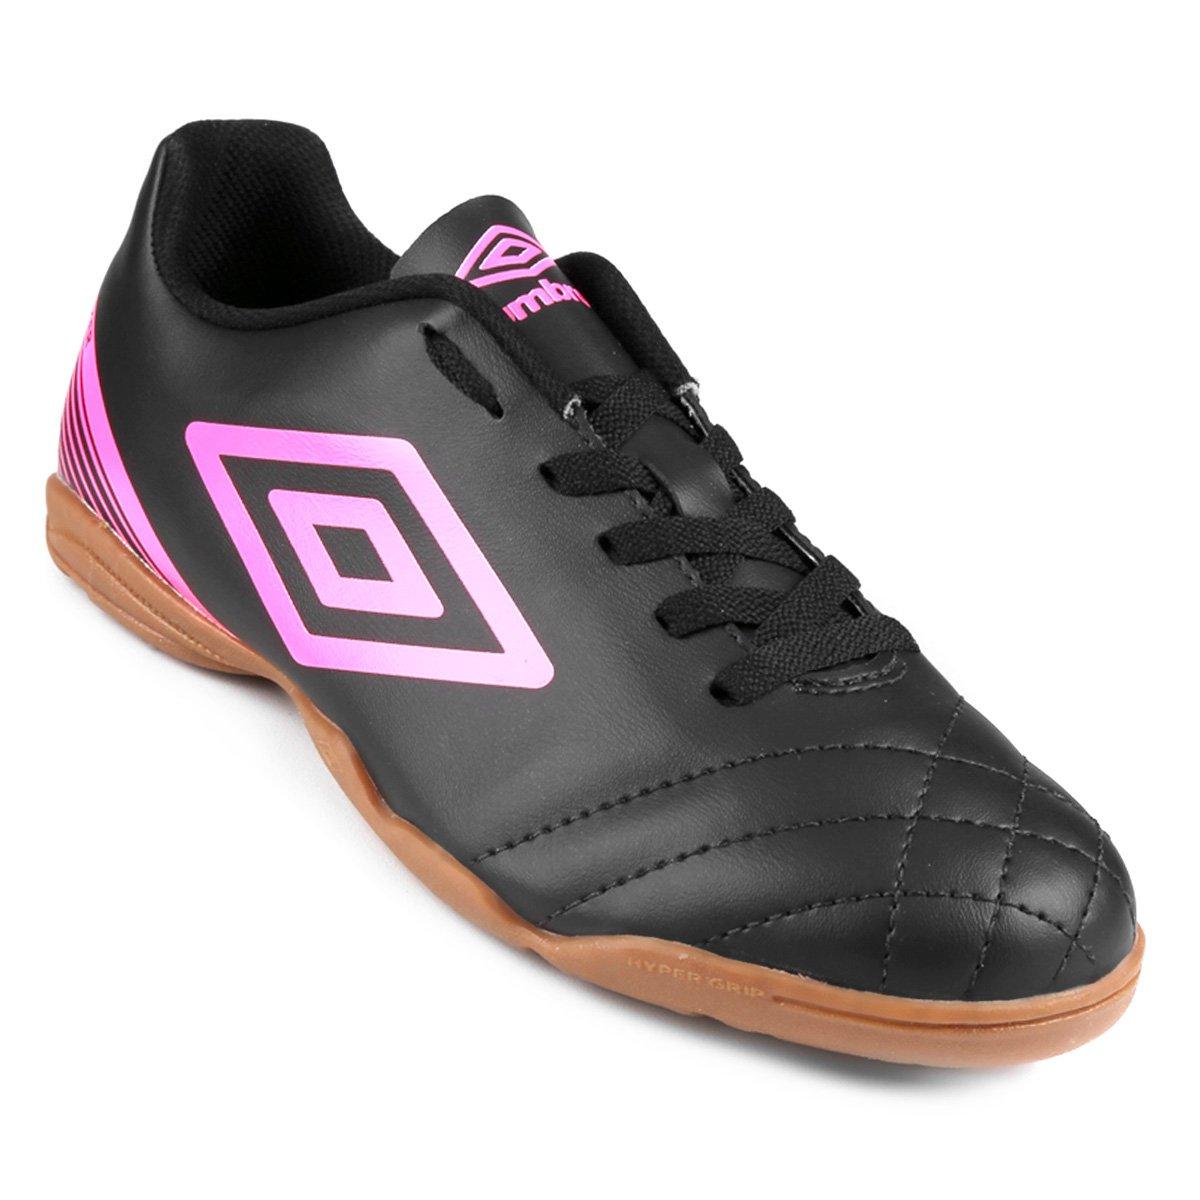 Chuteira Futsal Umbro Striker 3 Feminina - Compre Agora  19fe9f670ce7e